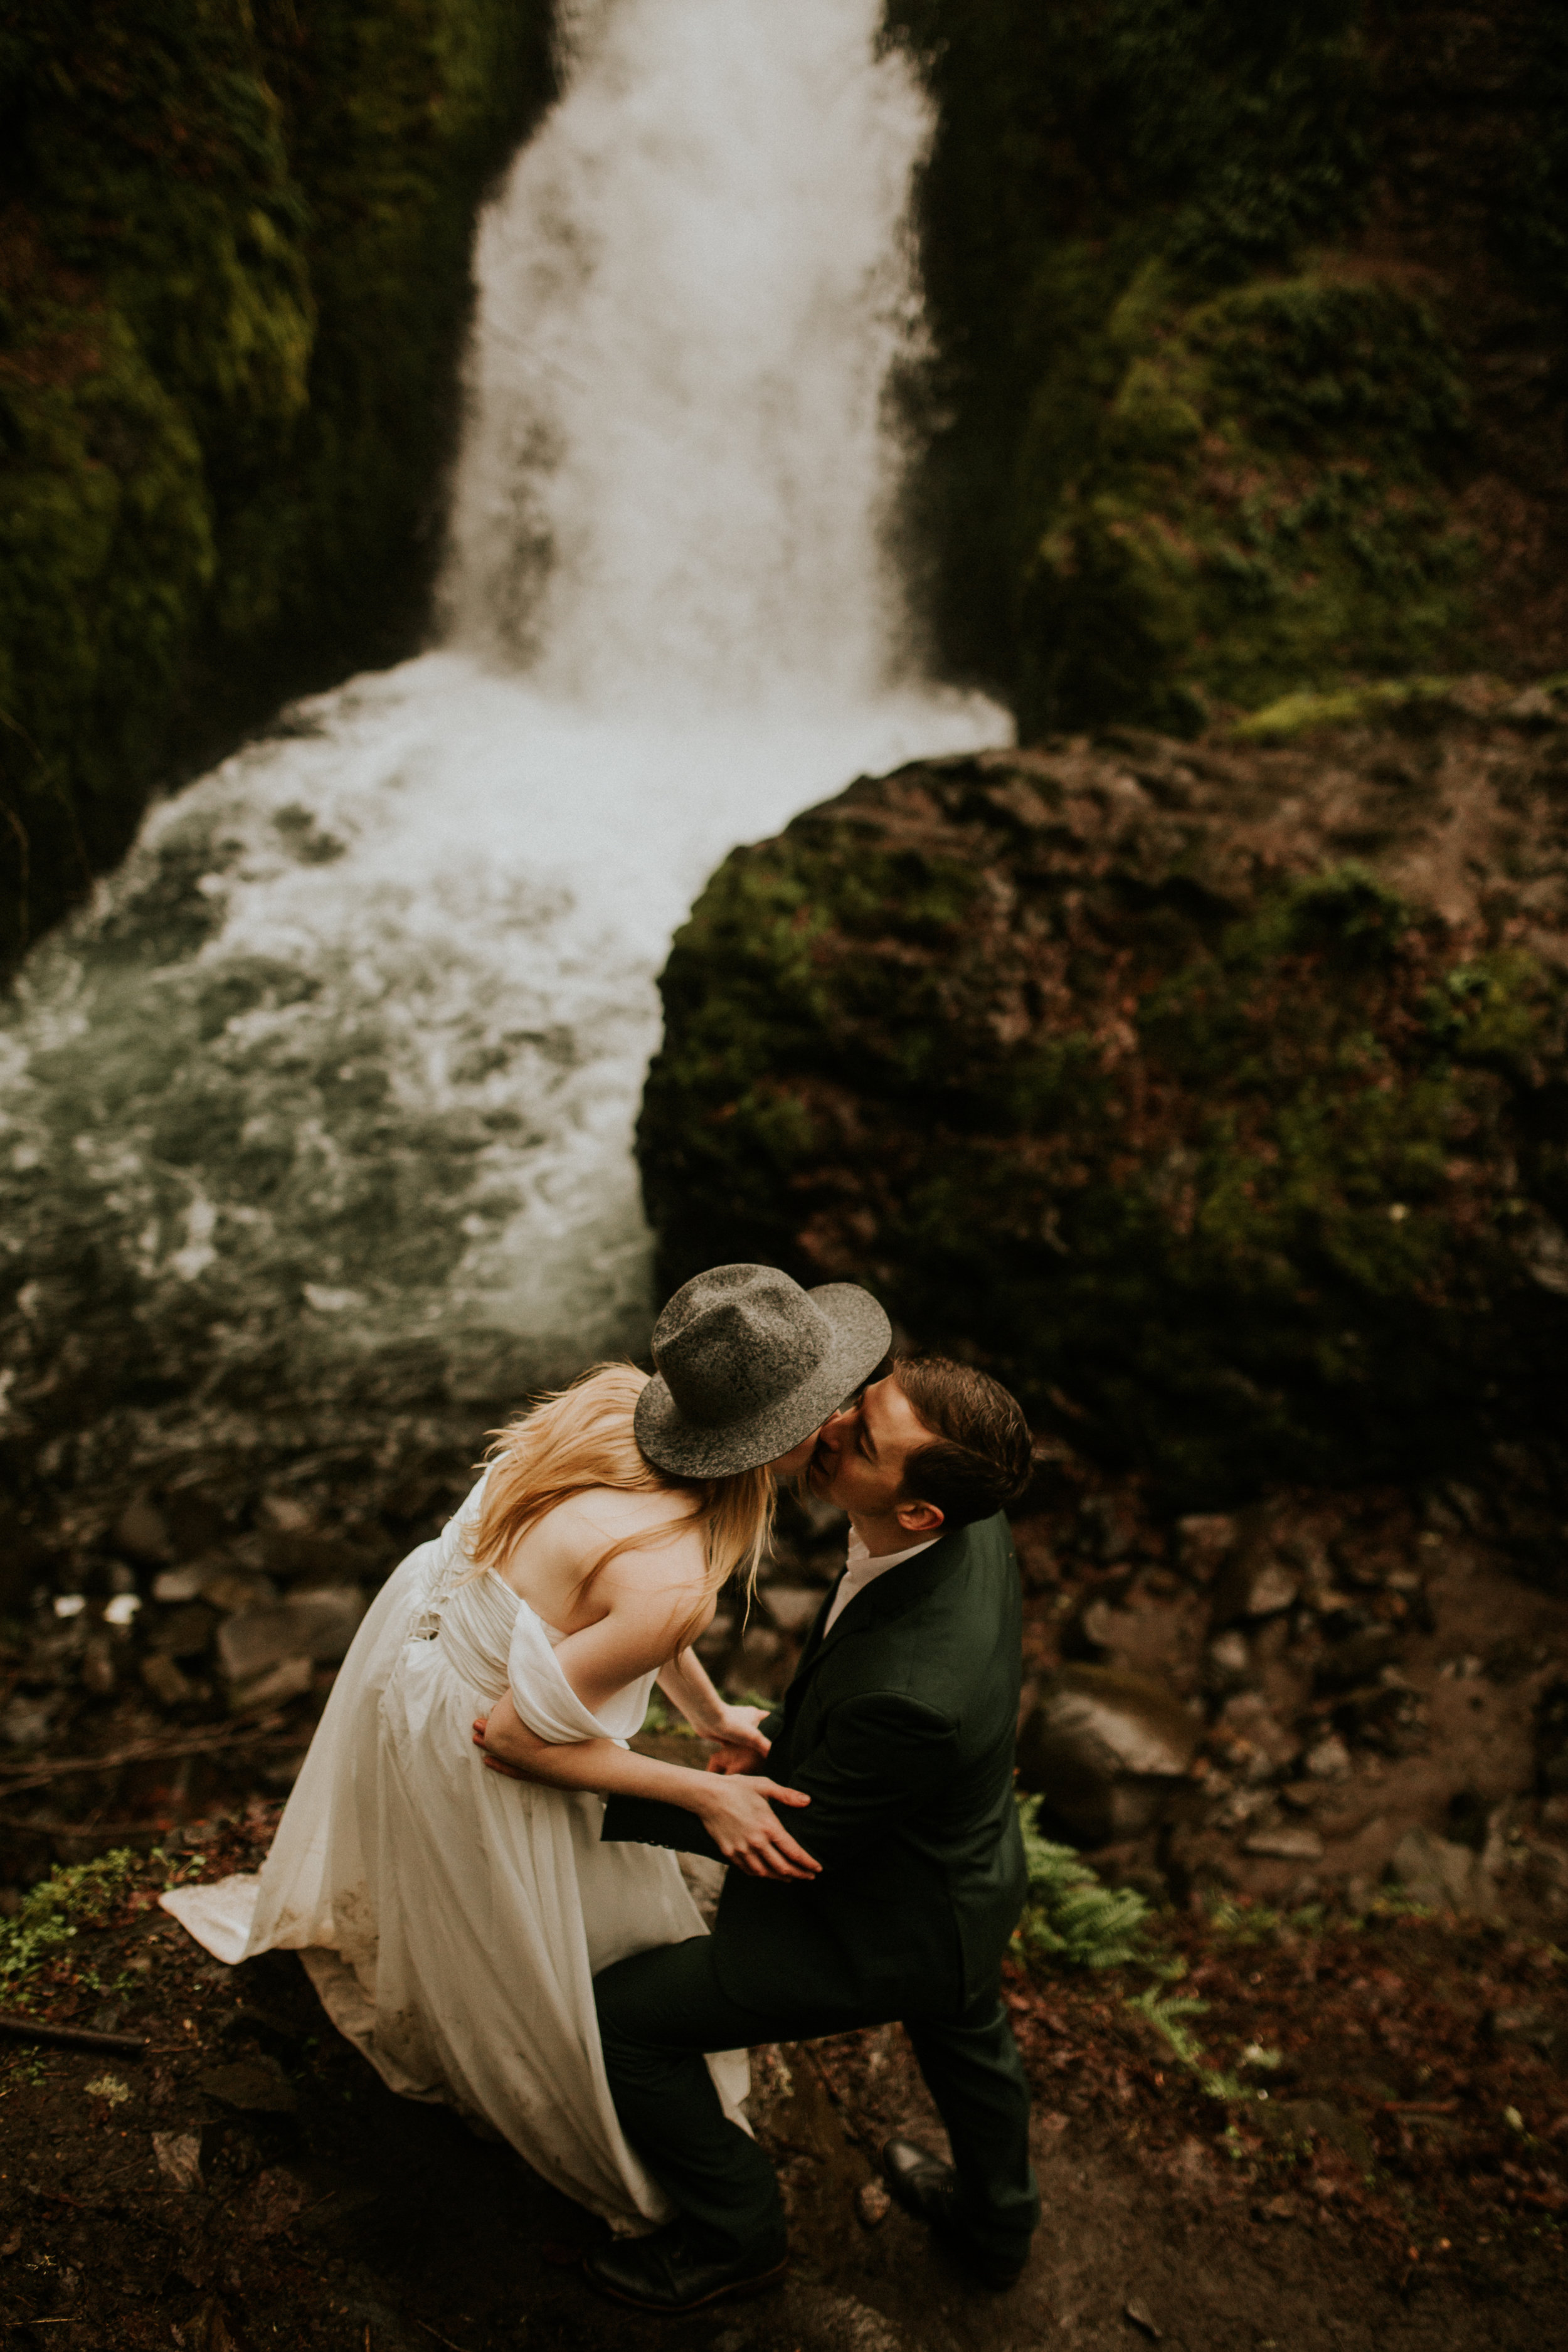 Elope-oregon-portland-bridal-veil-falls-elopement-breeanna-lasher-85.jpg